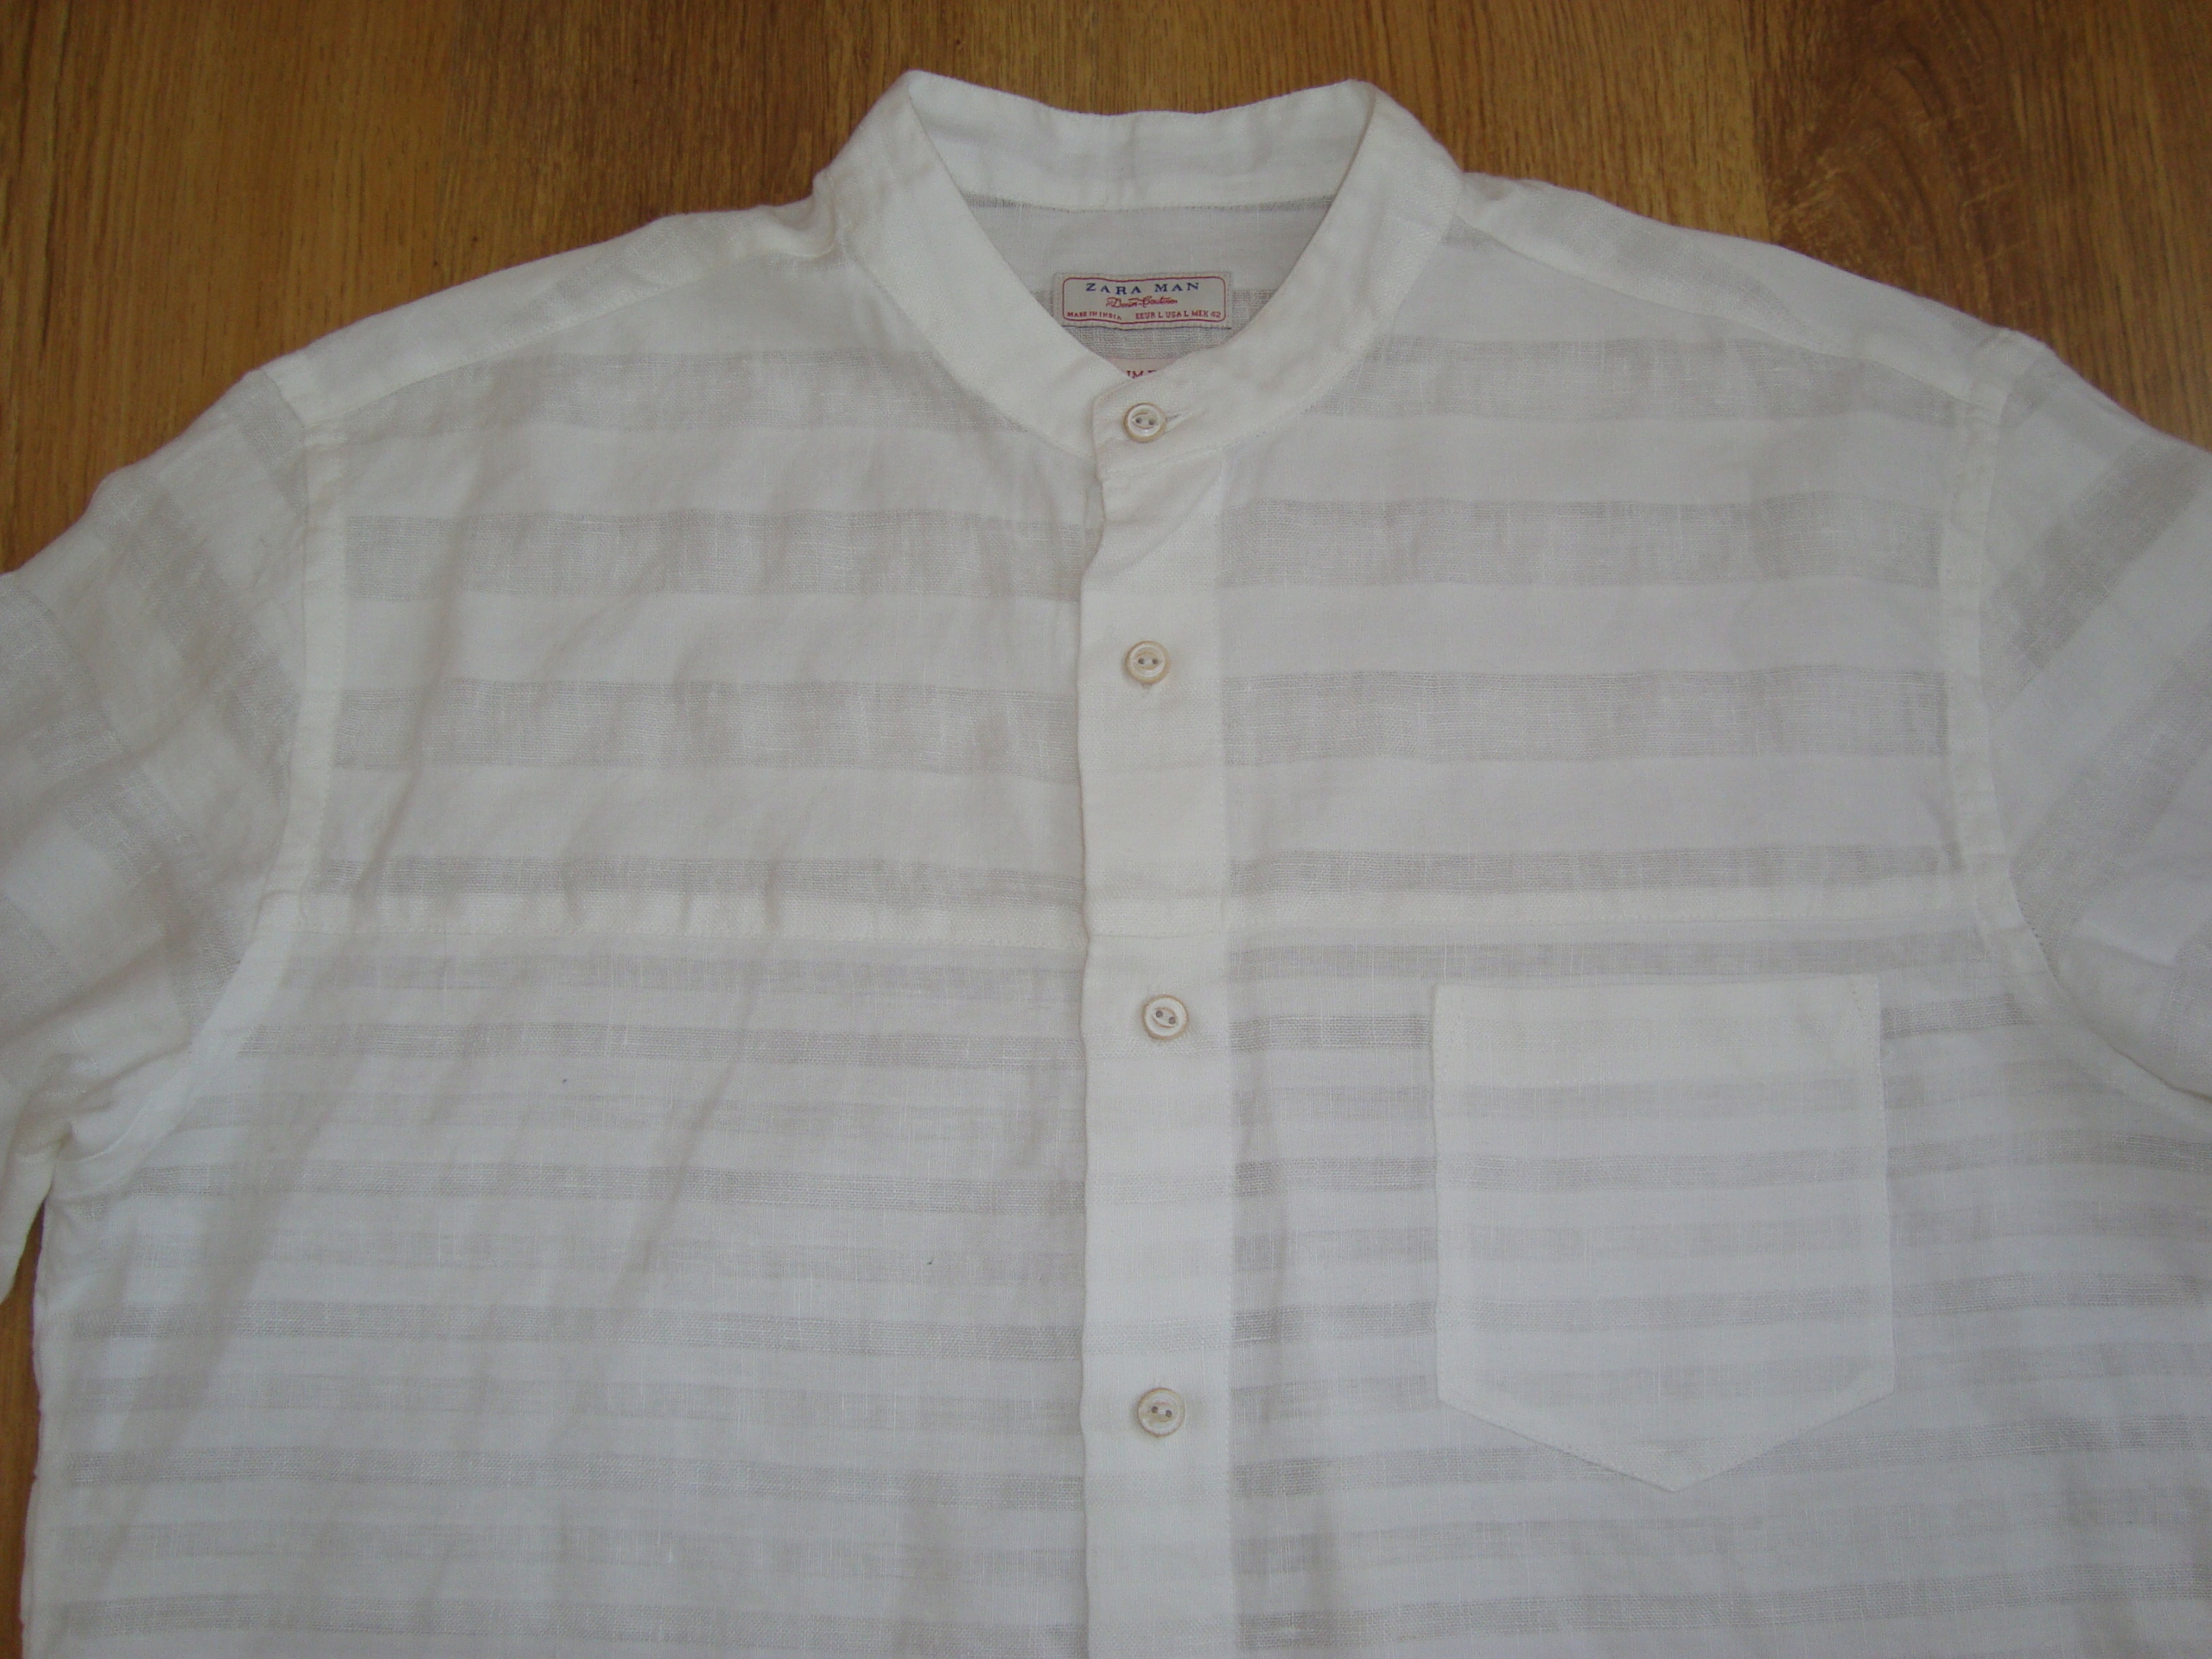 ZARA Lniana męska koszula len biała L stójka